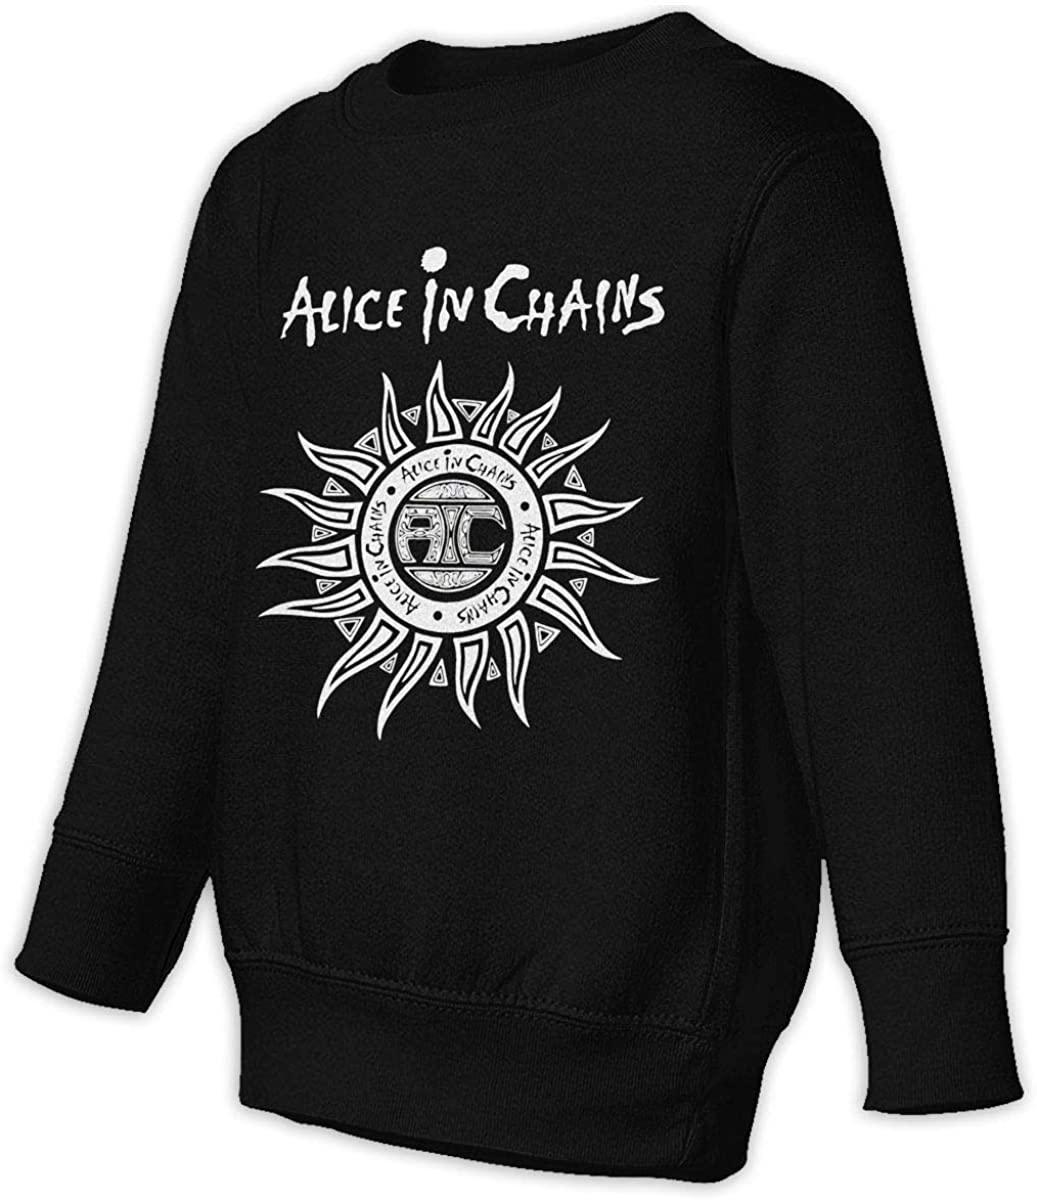 ASFSDGSDG Alice in Chains Unisex Sweatshirt Youth Boy and Girls Pullover Sweatshirt